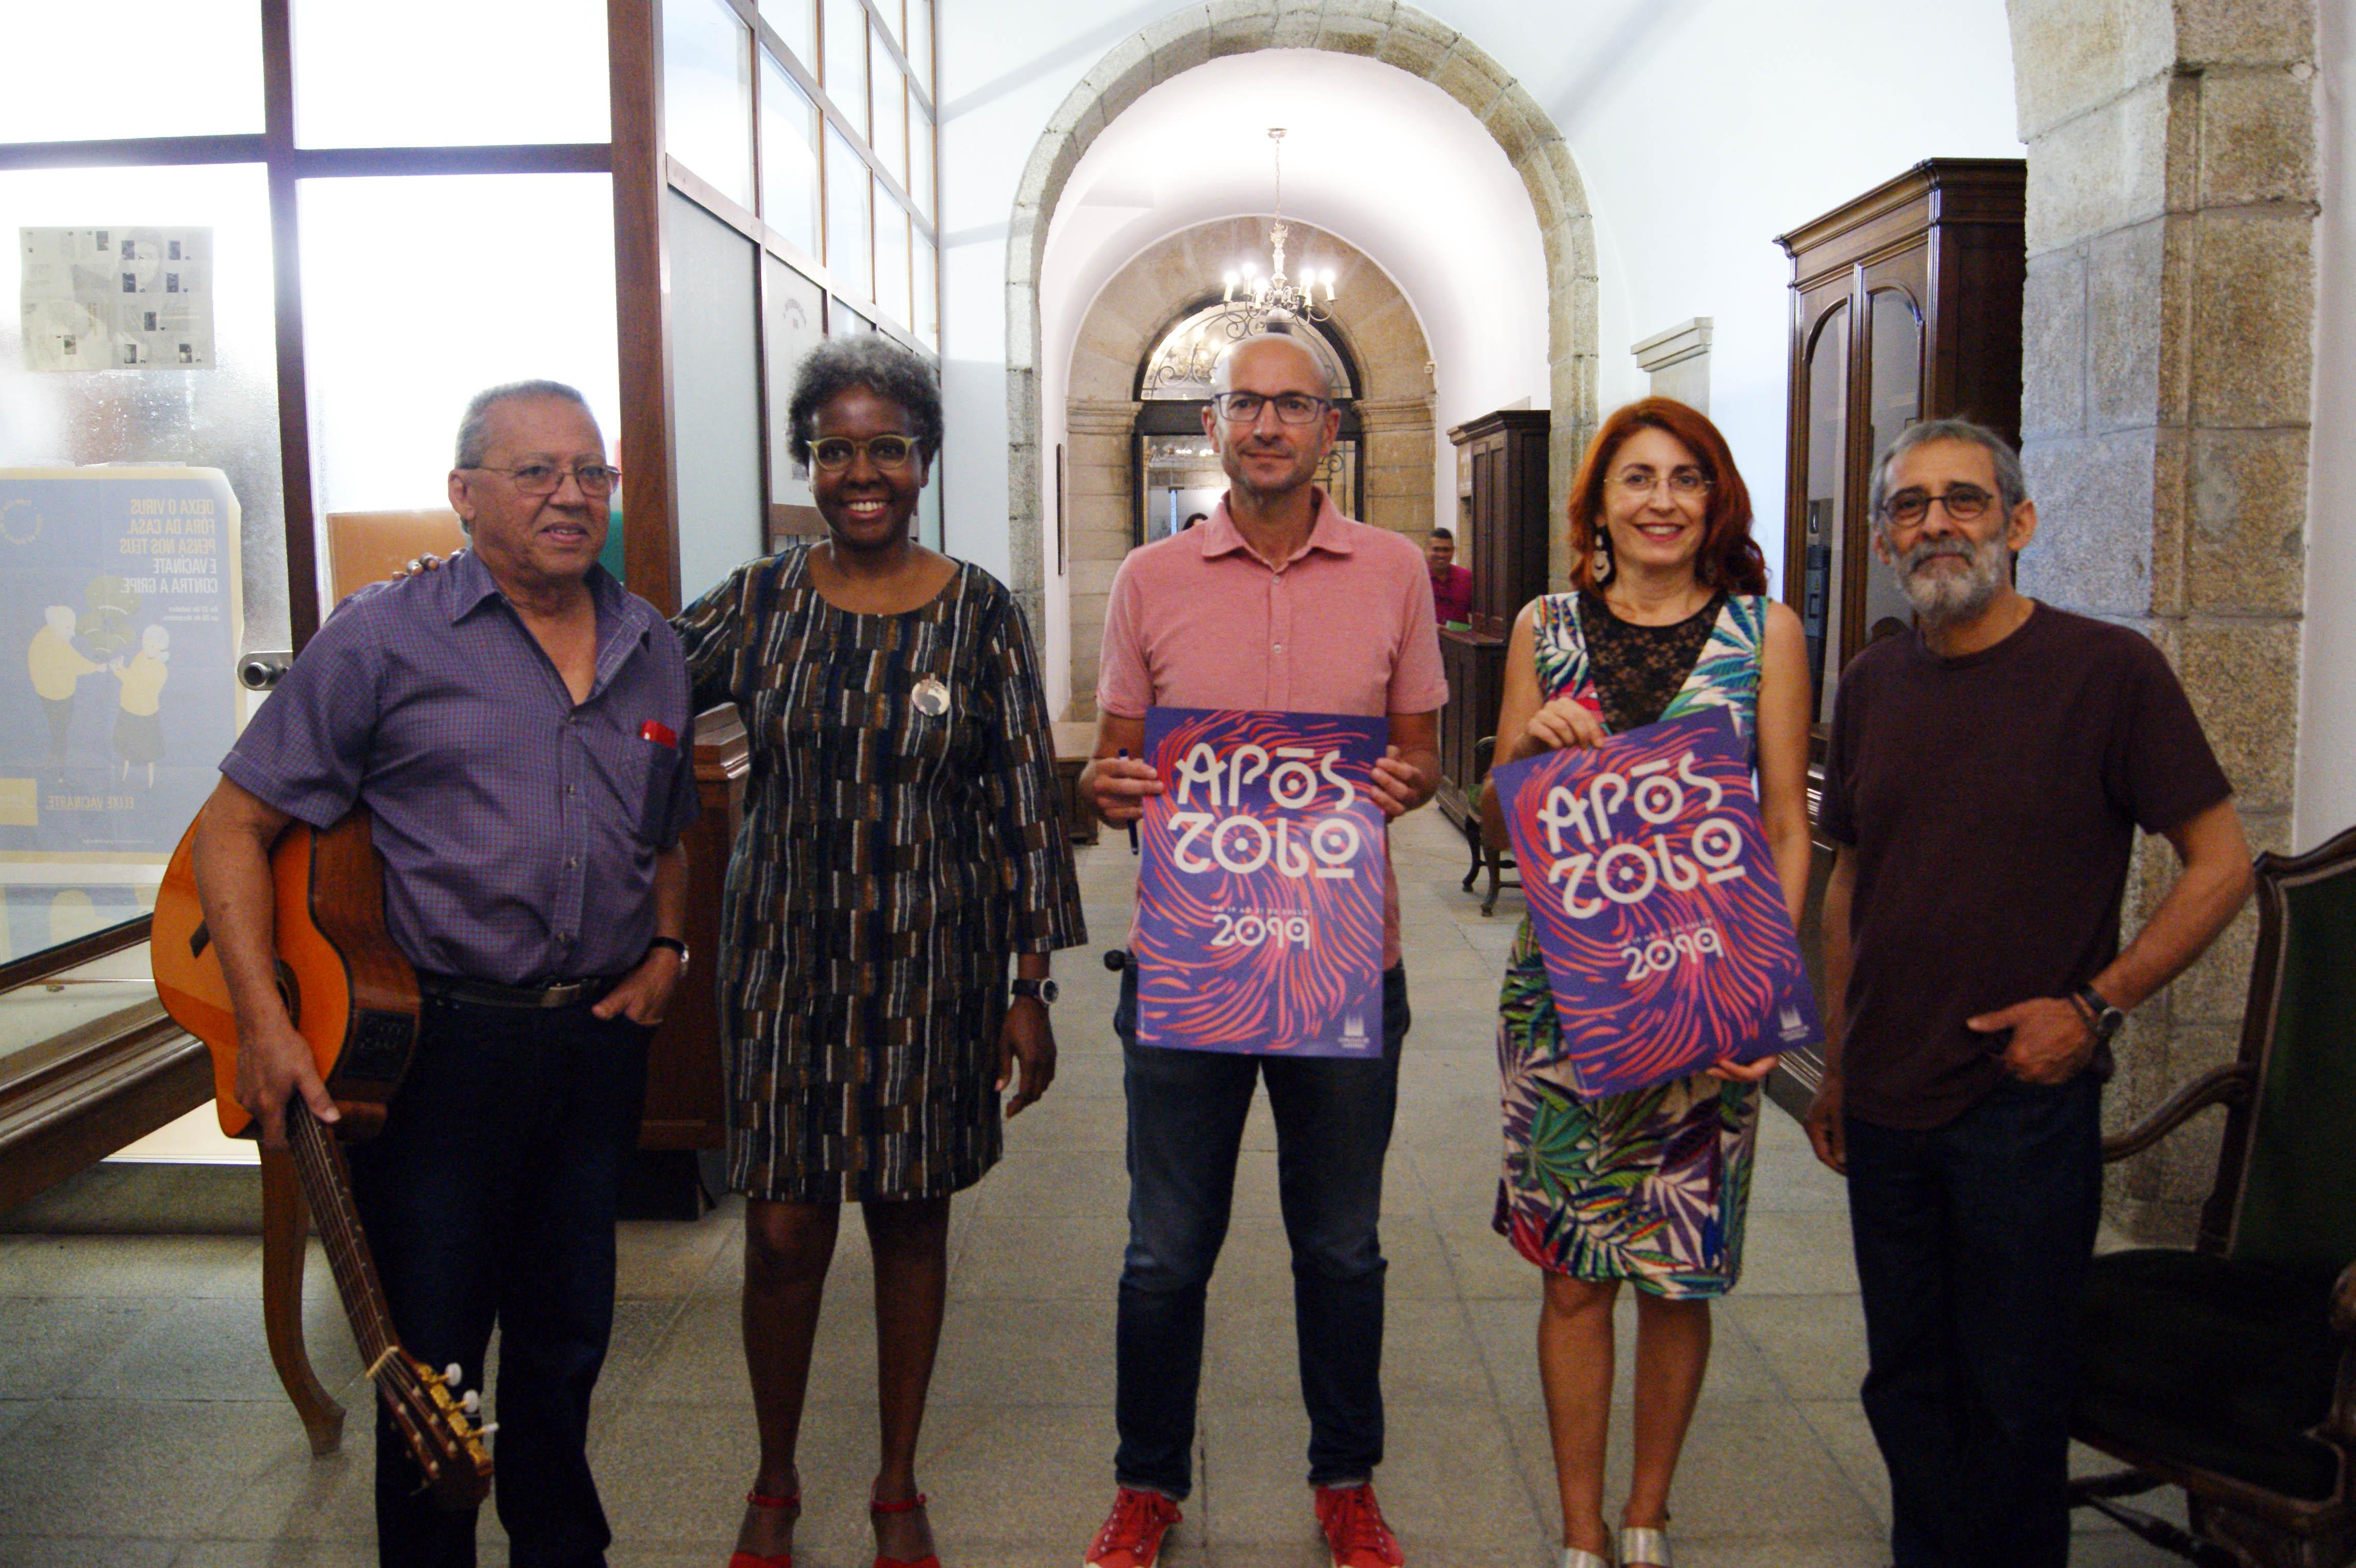 Rey Montesinos, Jamila Purofilin, Gonzalo Muíños, Montse Rivera e Xosé V. Ferreirós.